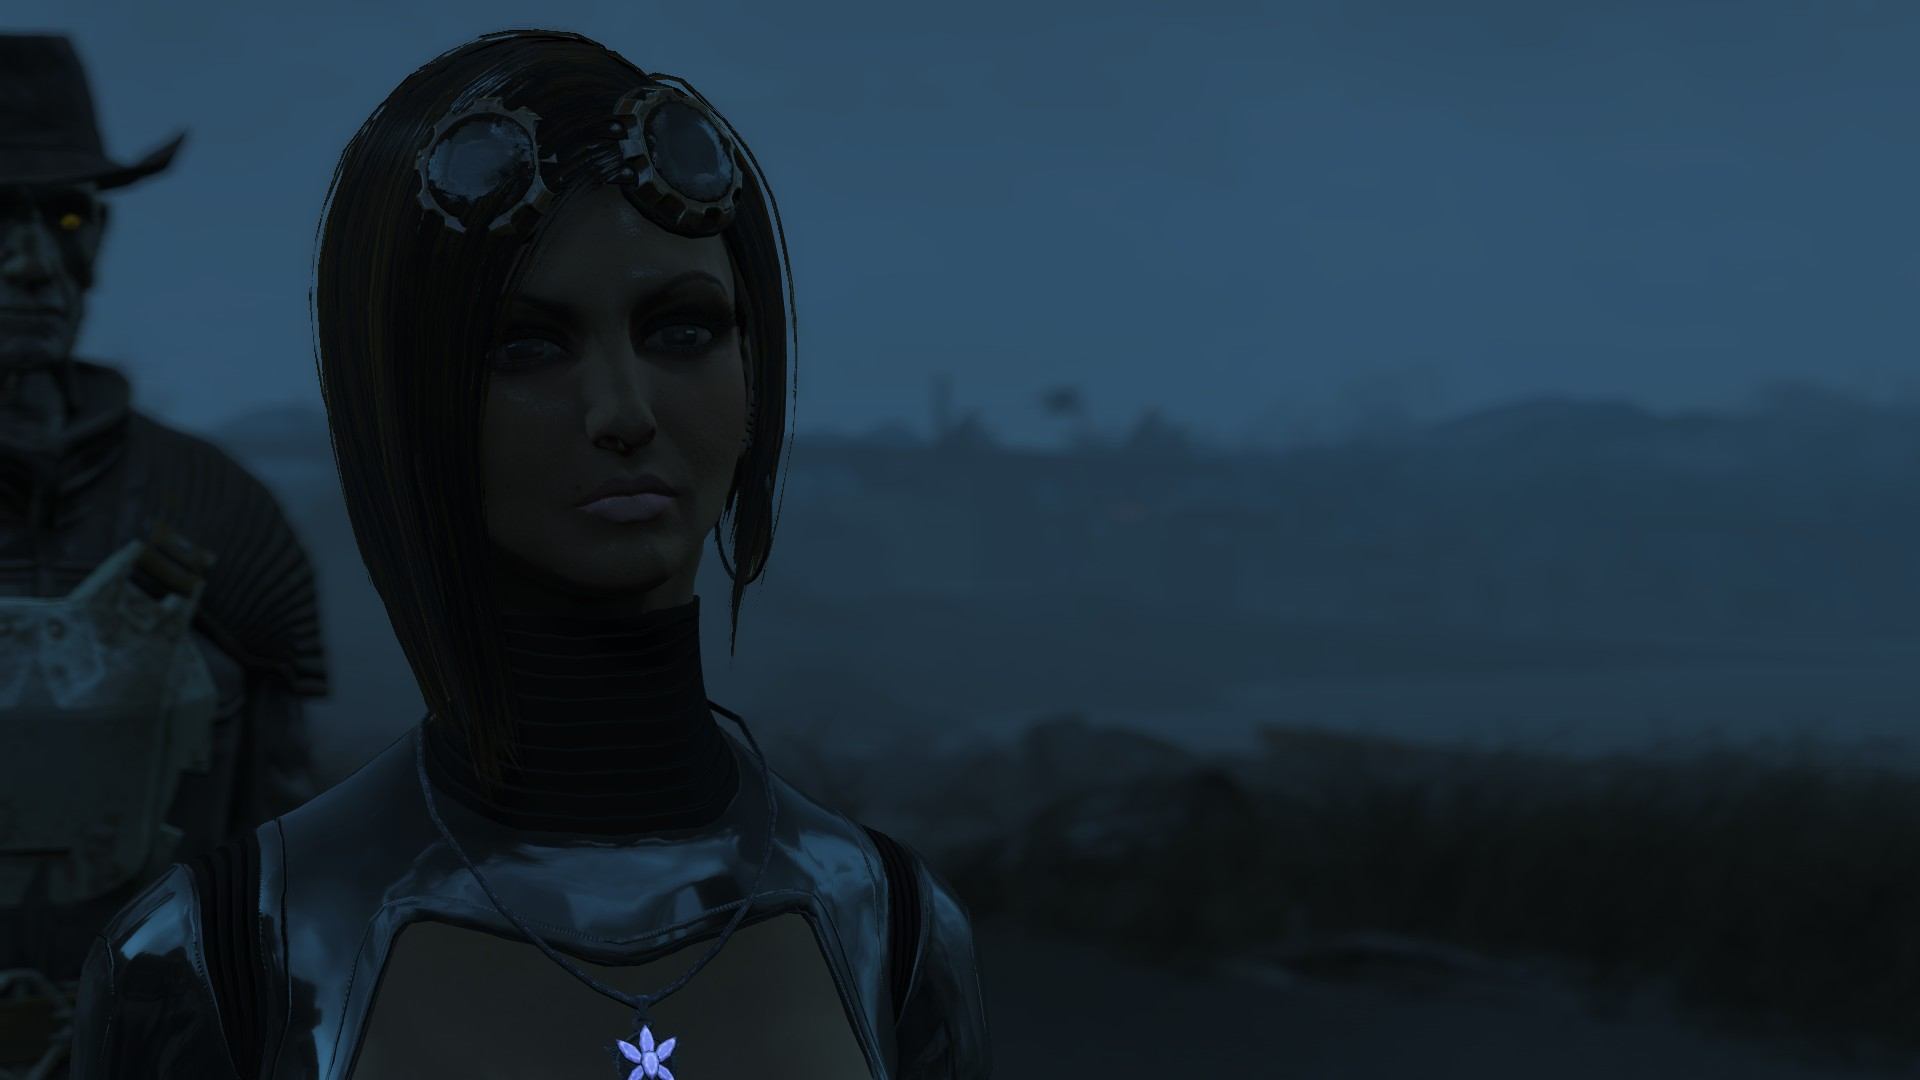 20180209180202_1.jpg - Fallout 4